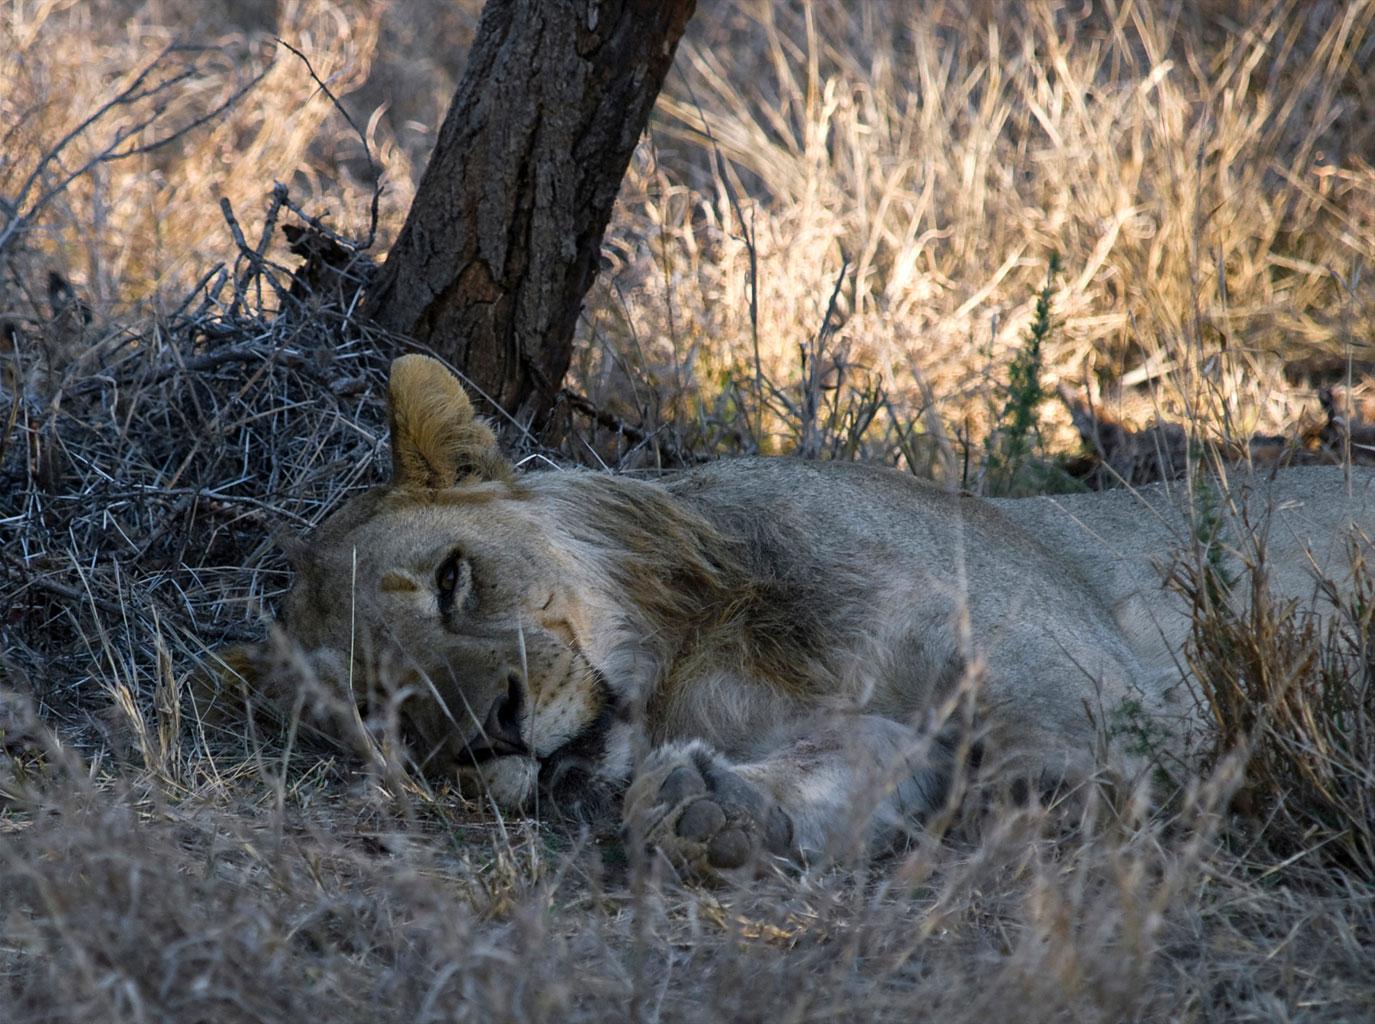 The sleeping Lion